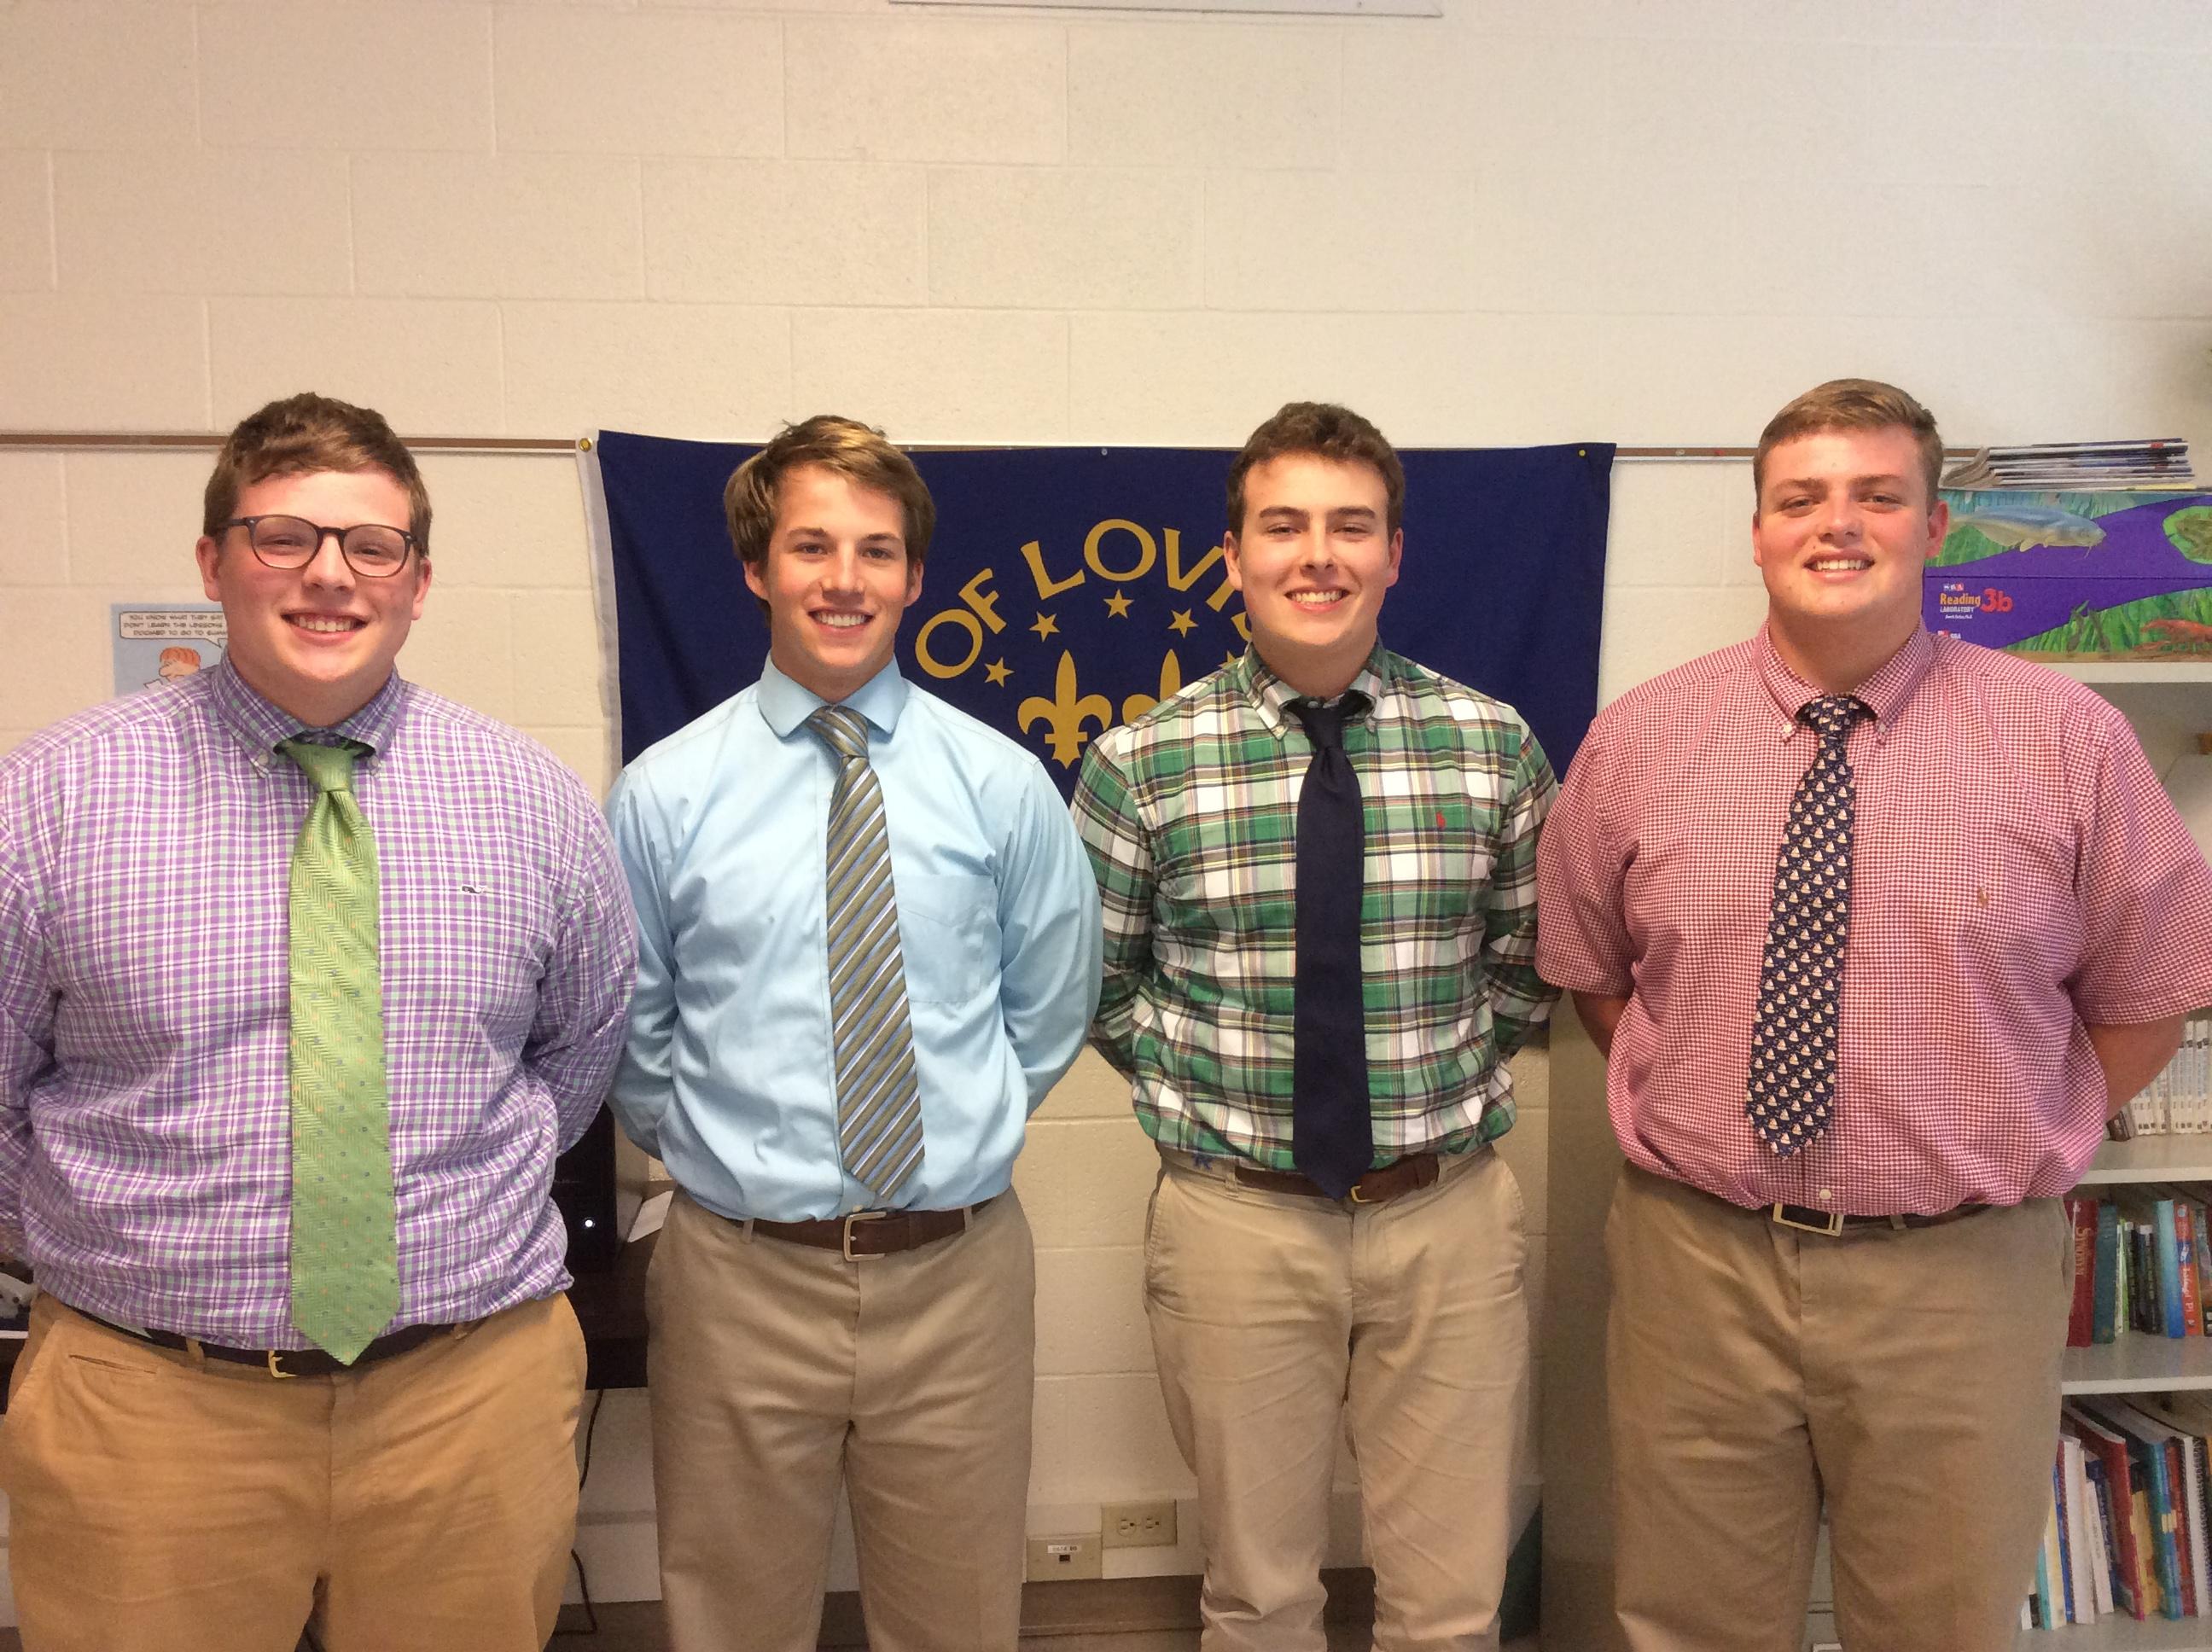 Saint Xavier High School Nick Canaday, Alex Feller, Ben Chambers, and Aaron Curley